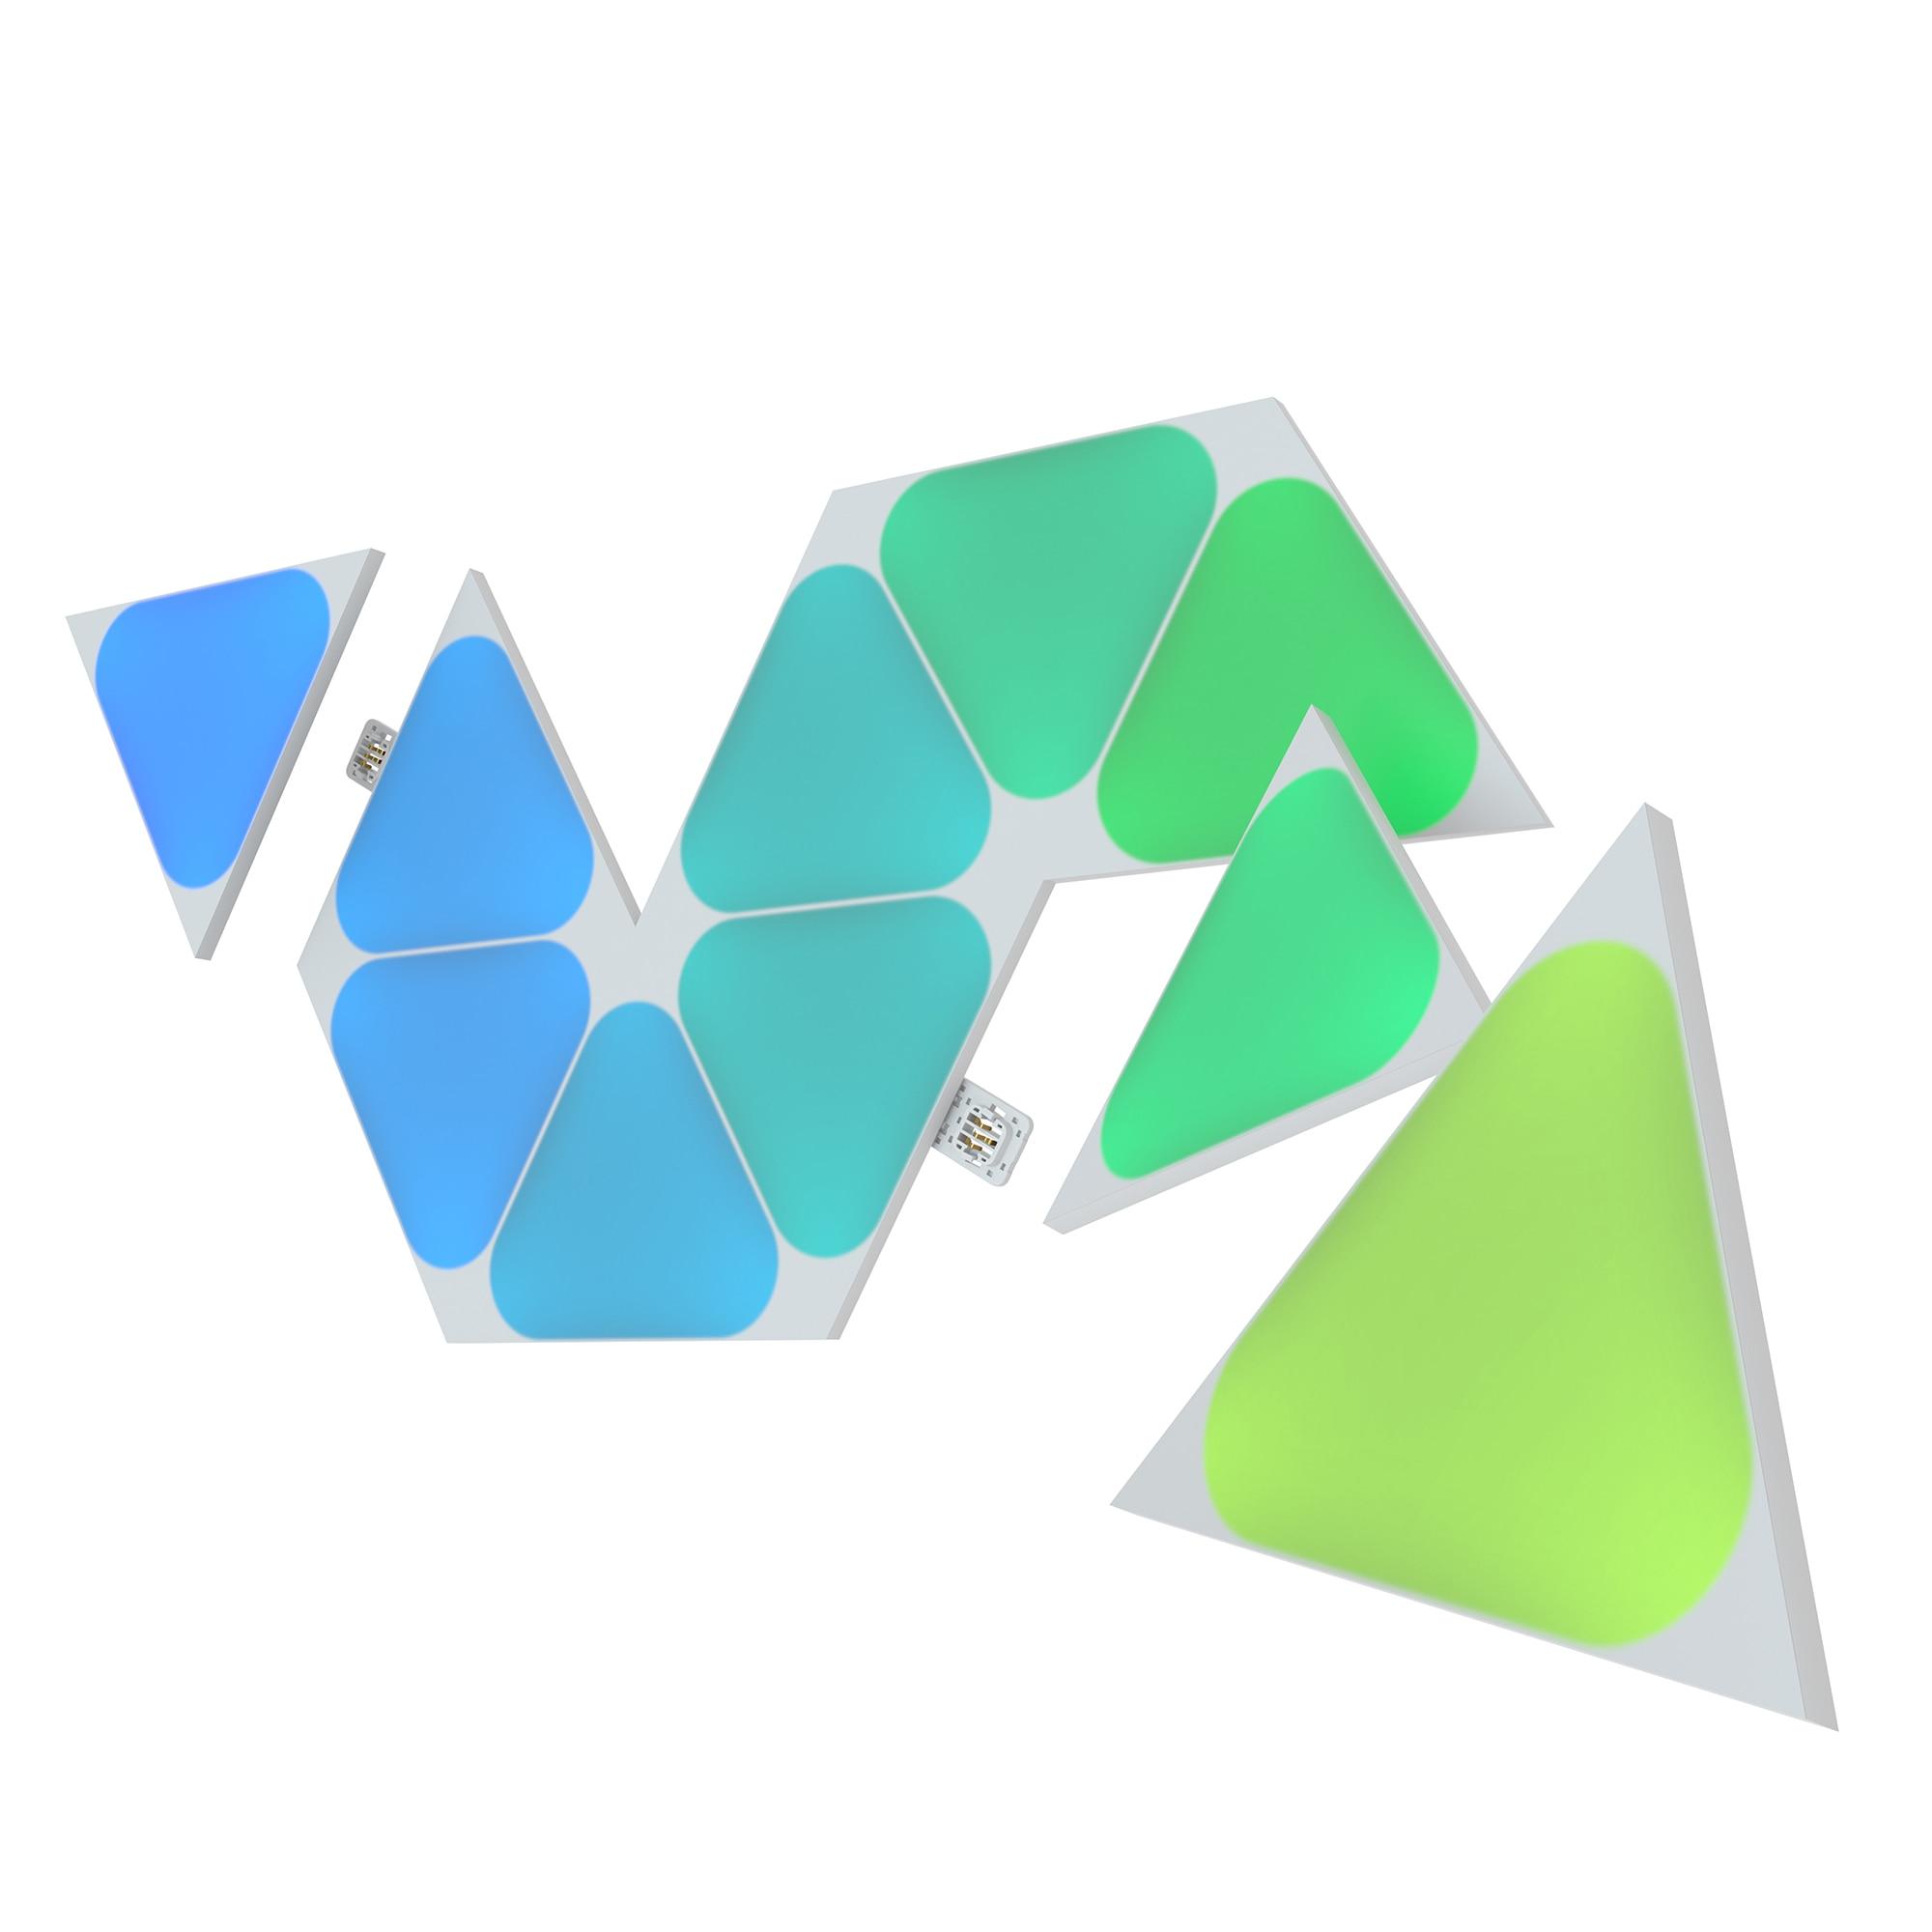 Fotografie Kit panouri luminoase LED modulare inteligente Nanoleaf Shapes Triangles Mini Starter Kit, RGBW, W-Fi, 100 lm, senzor muzica, compatibil iOS/Android, Apple HomeKit/Google Home/Amazon Alexa, 5 panouri